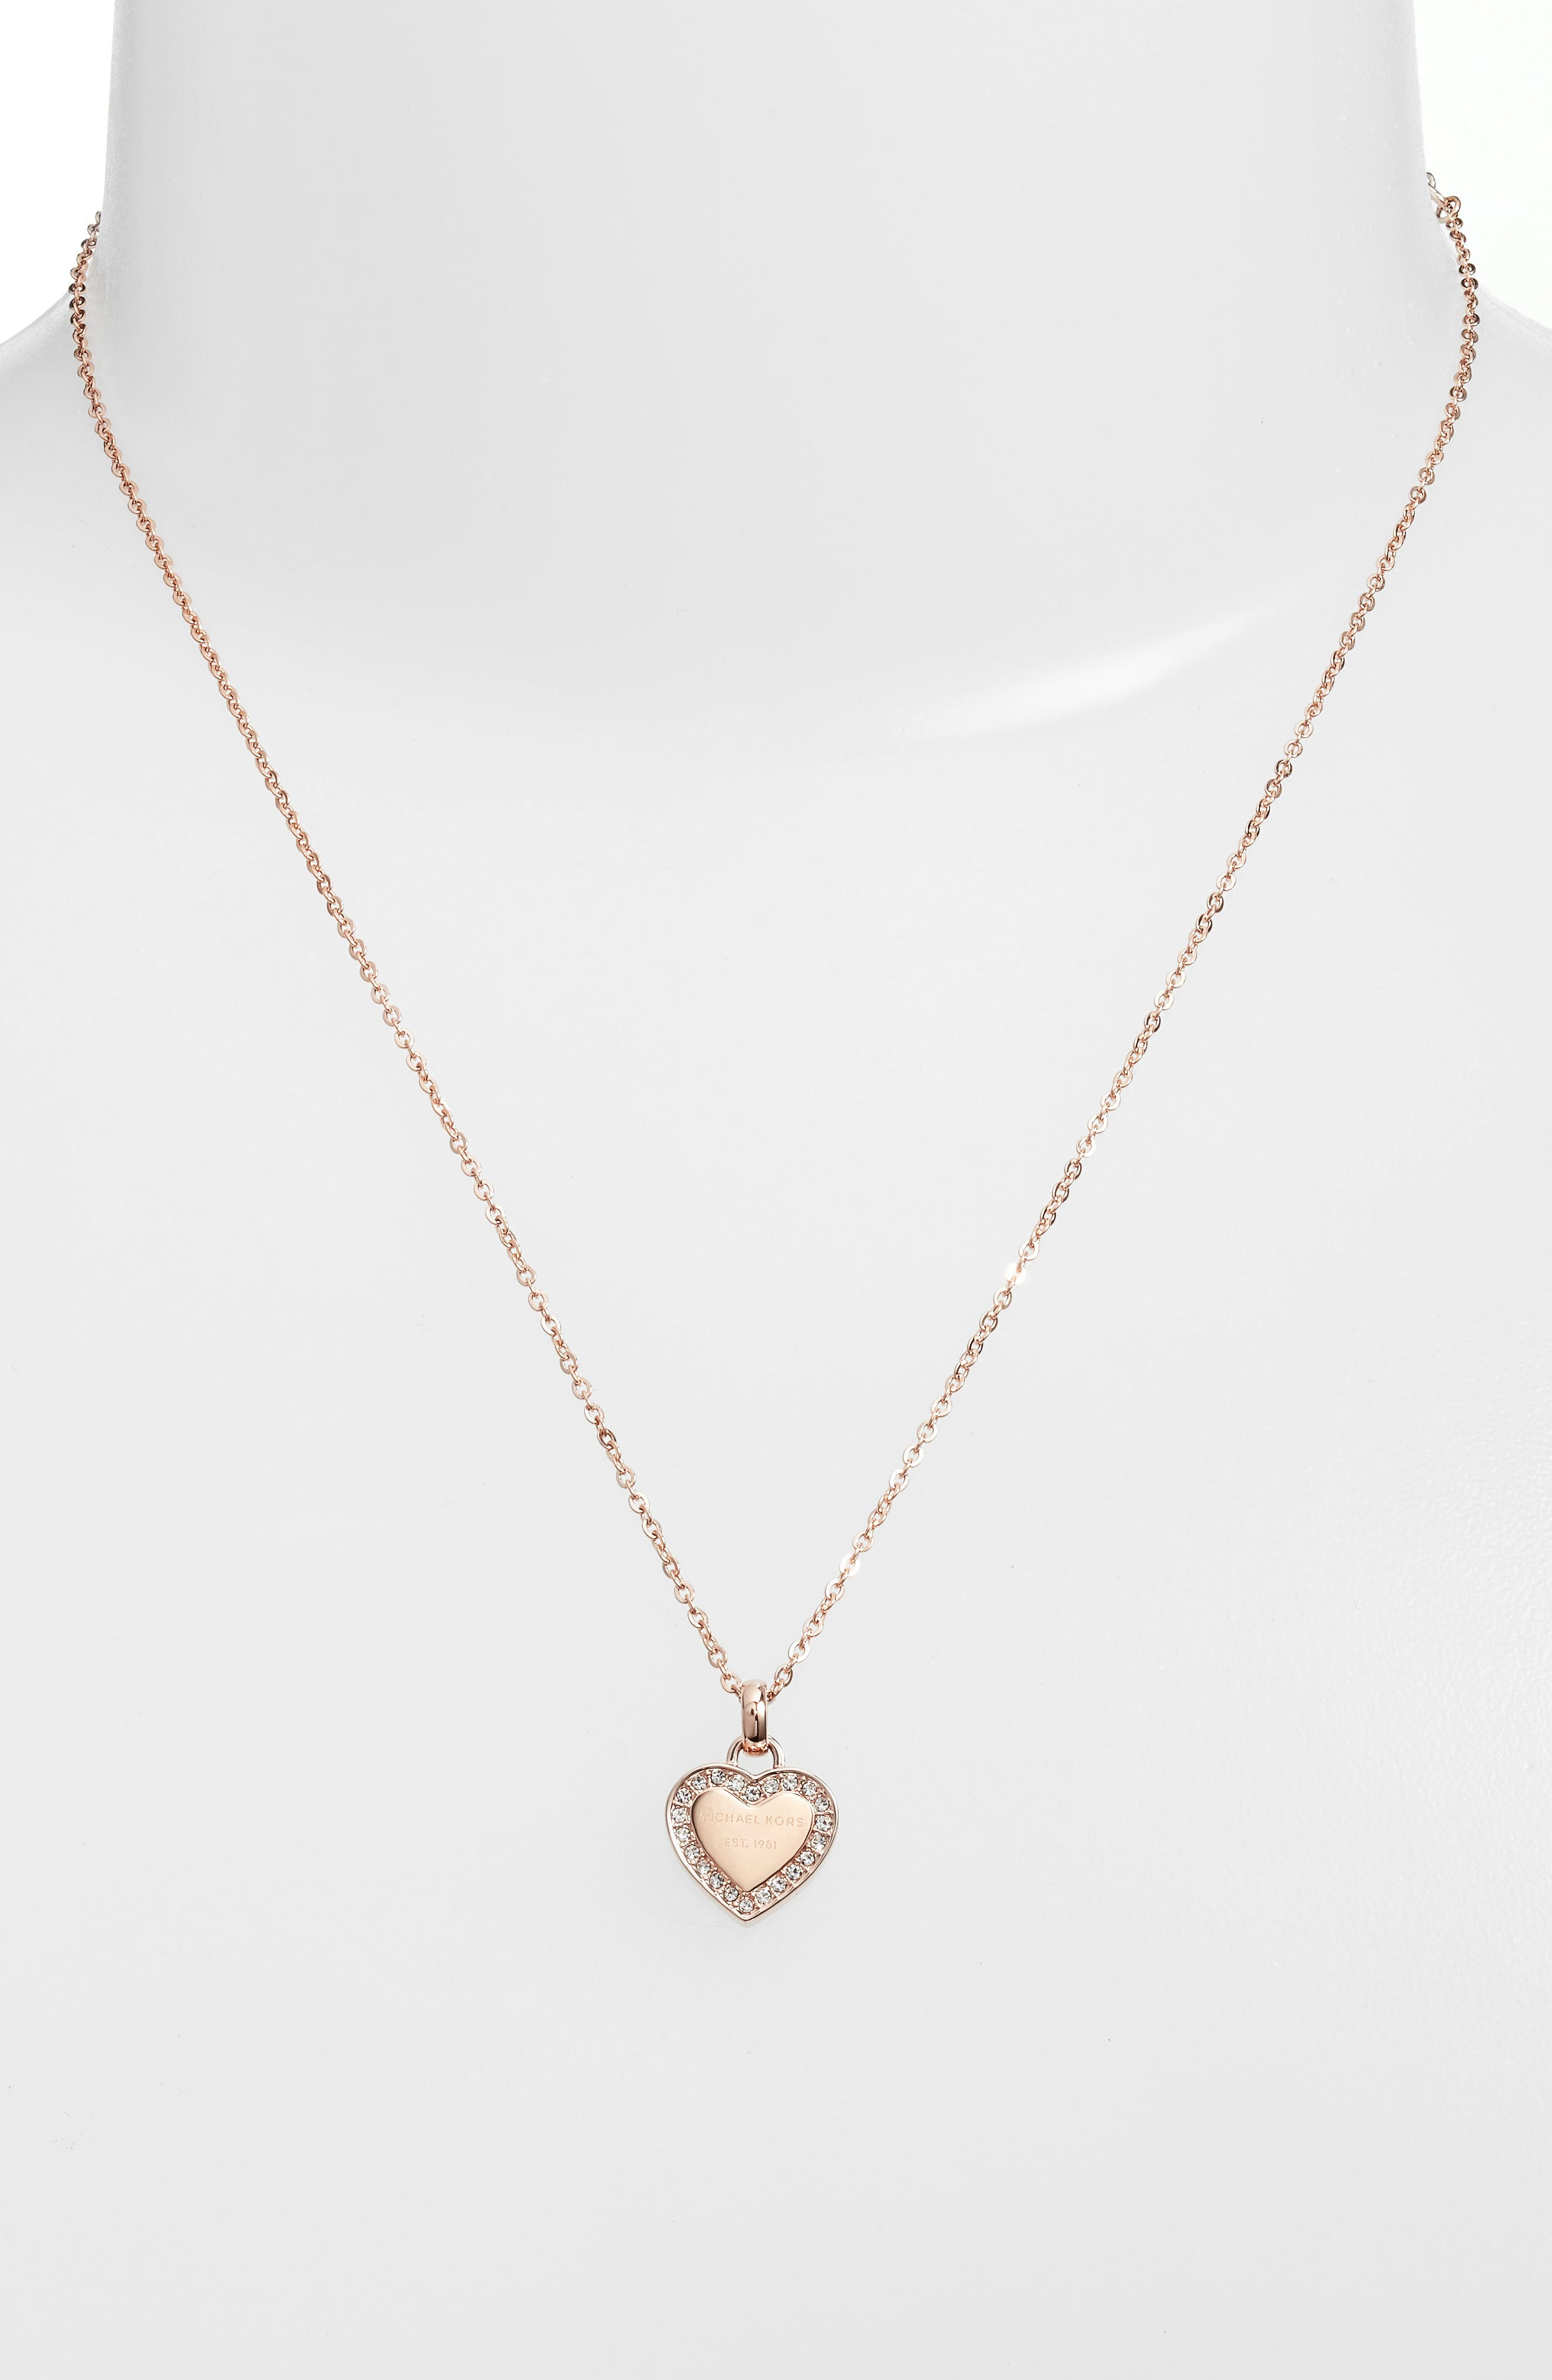 Main Image - Michael Kors Heart Pendant Necklace